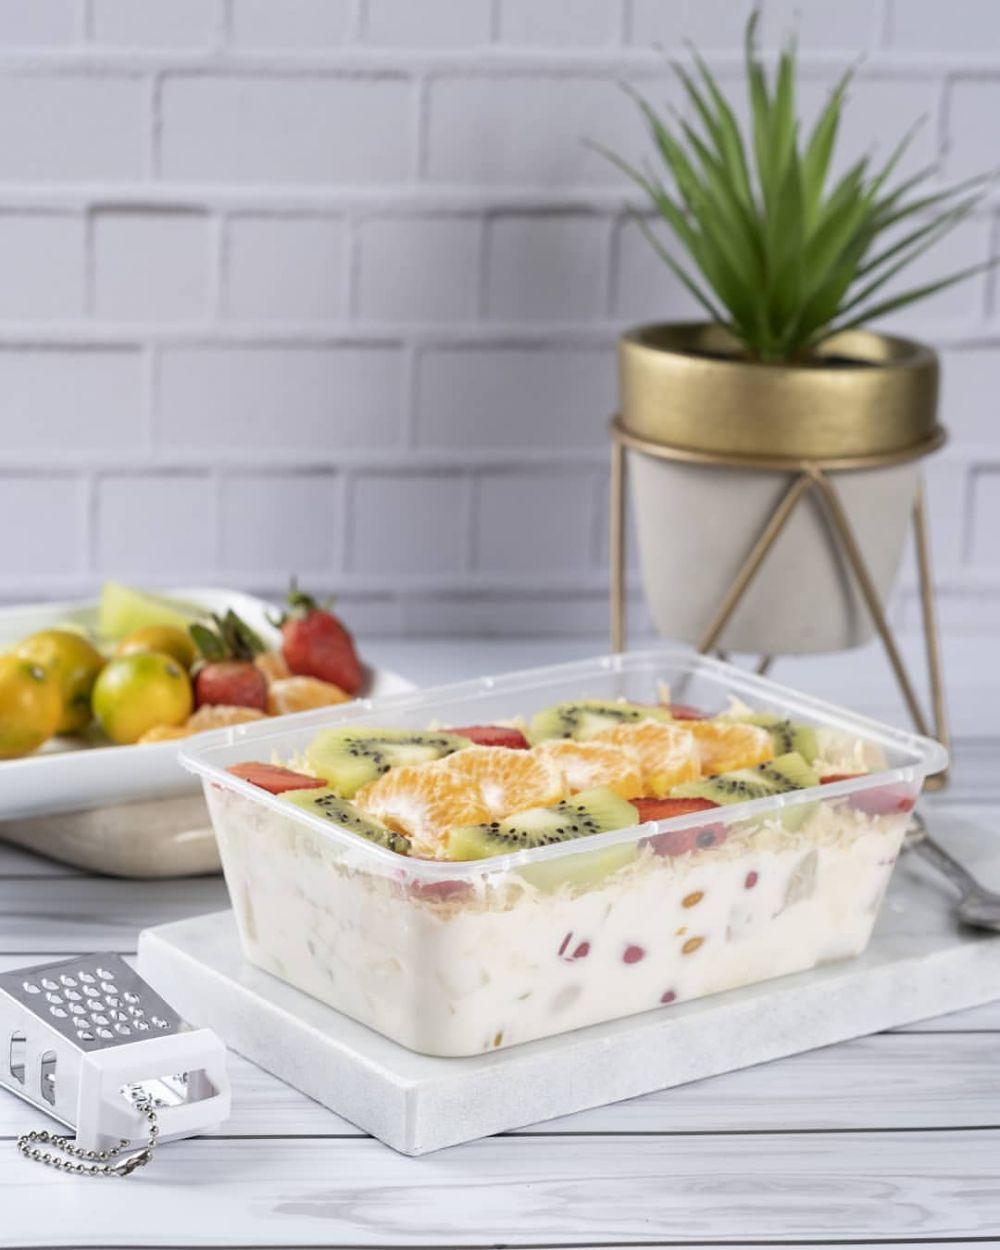 salad buah yoghurt instagram